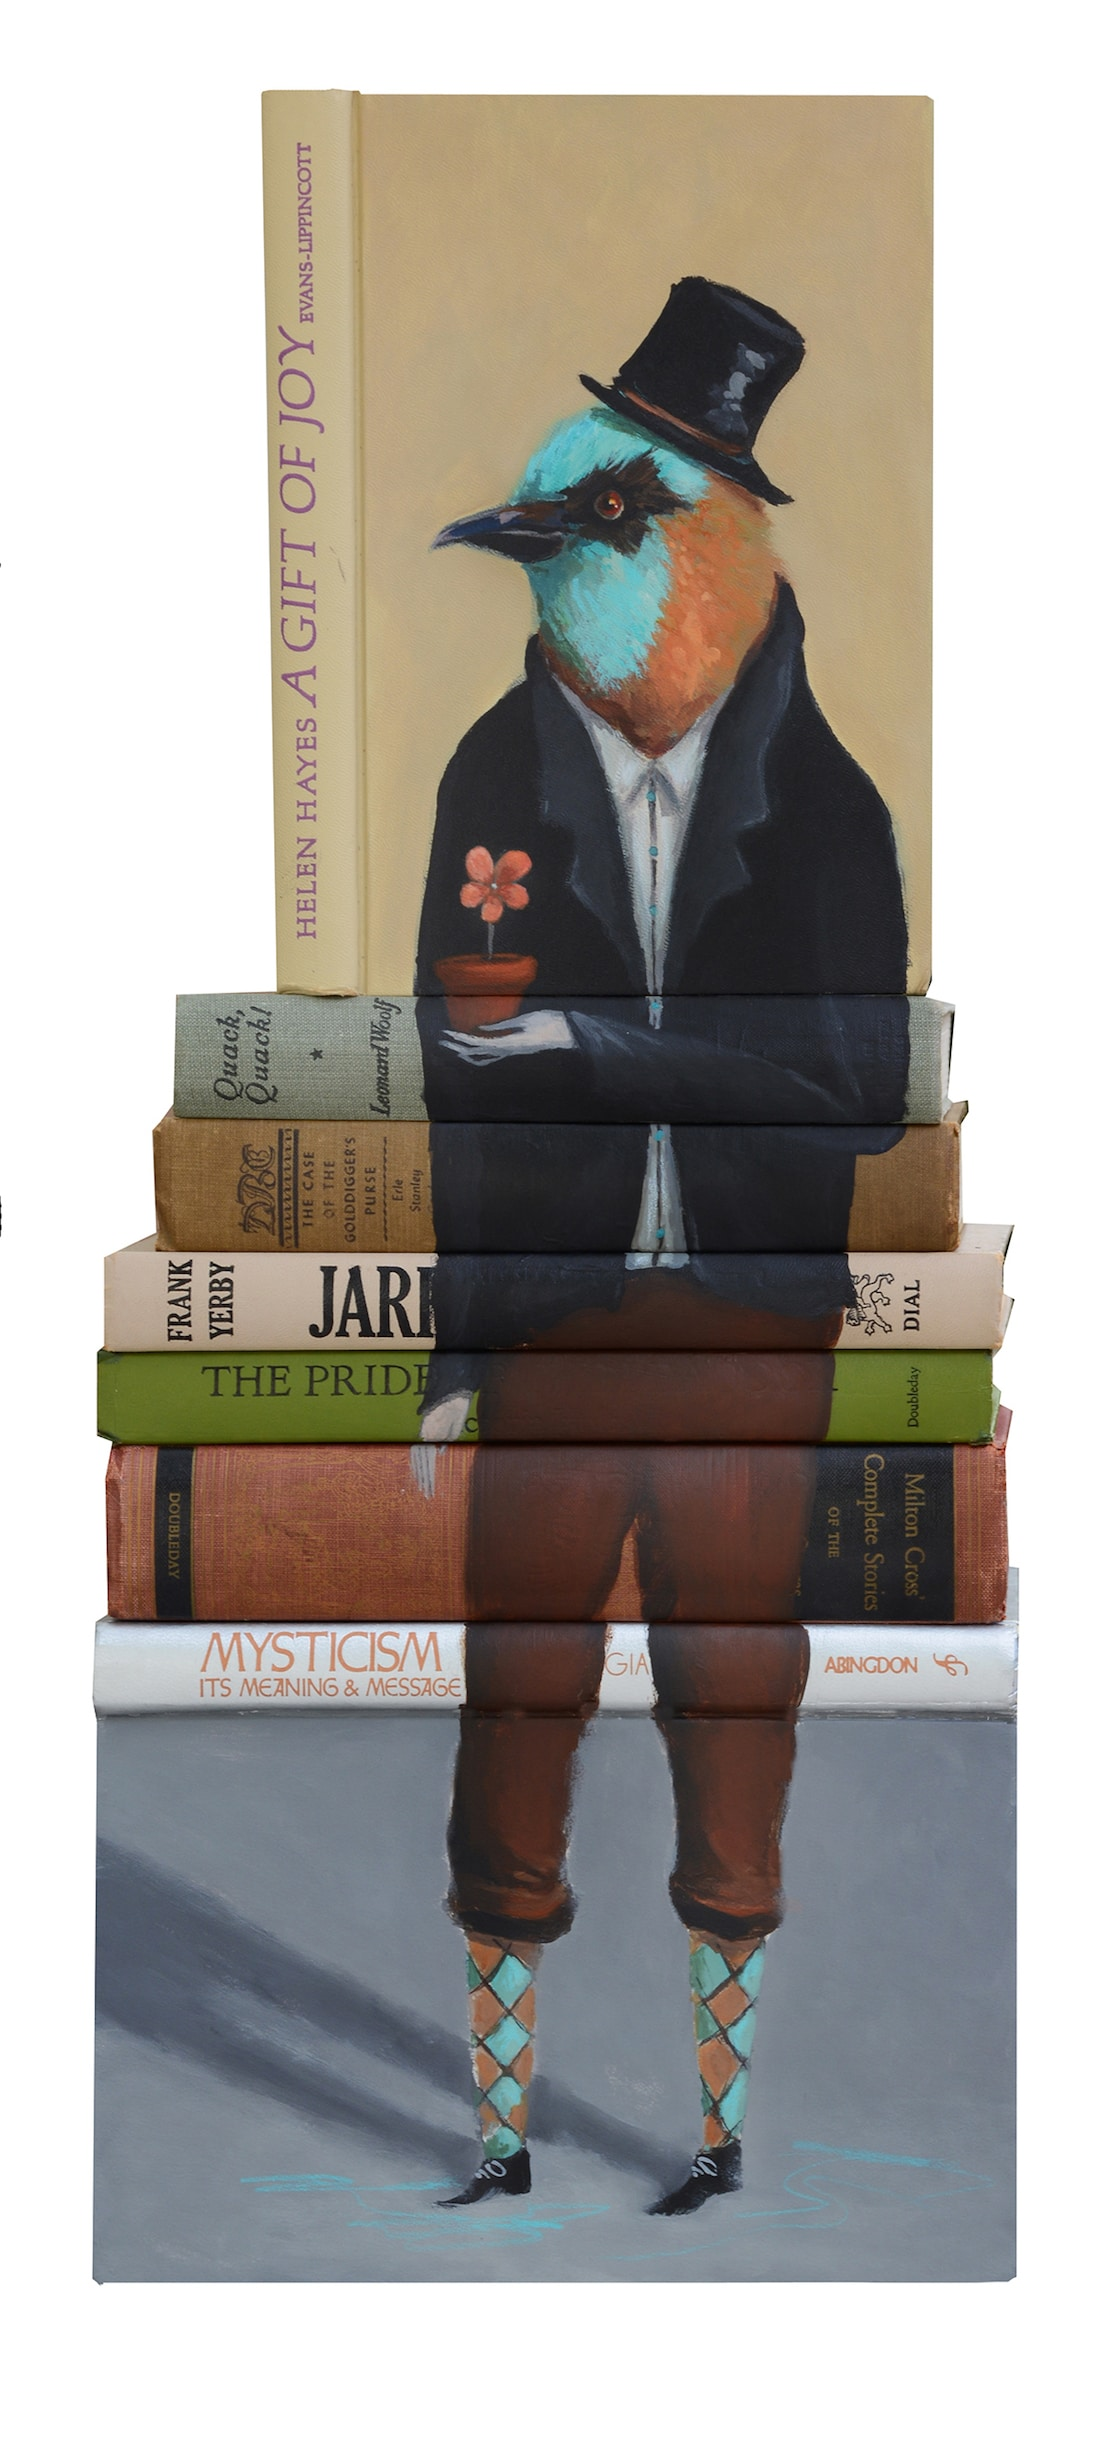 Mike Stilkey arte con libros